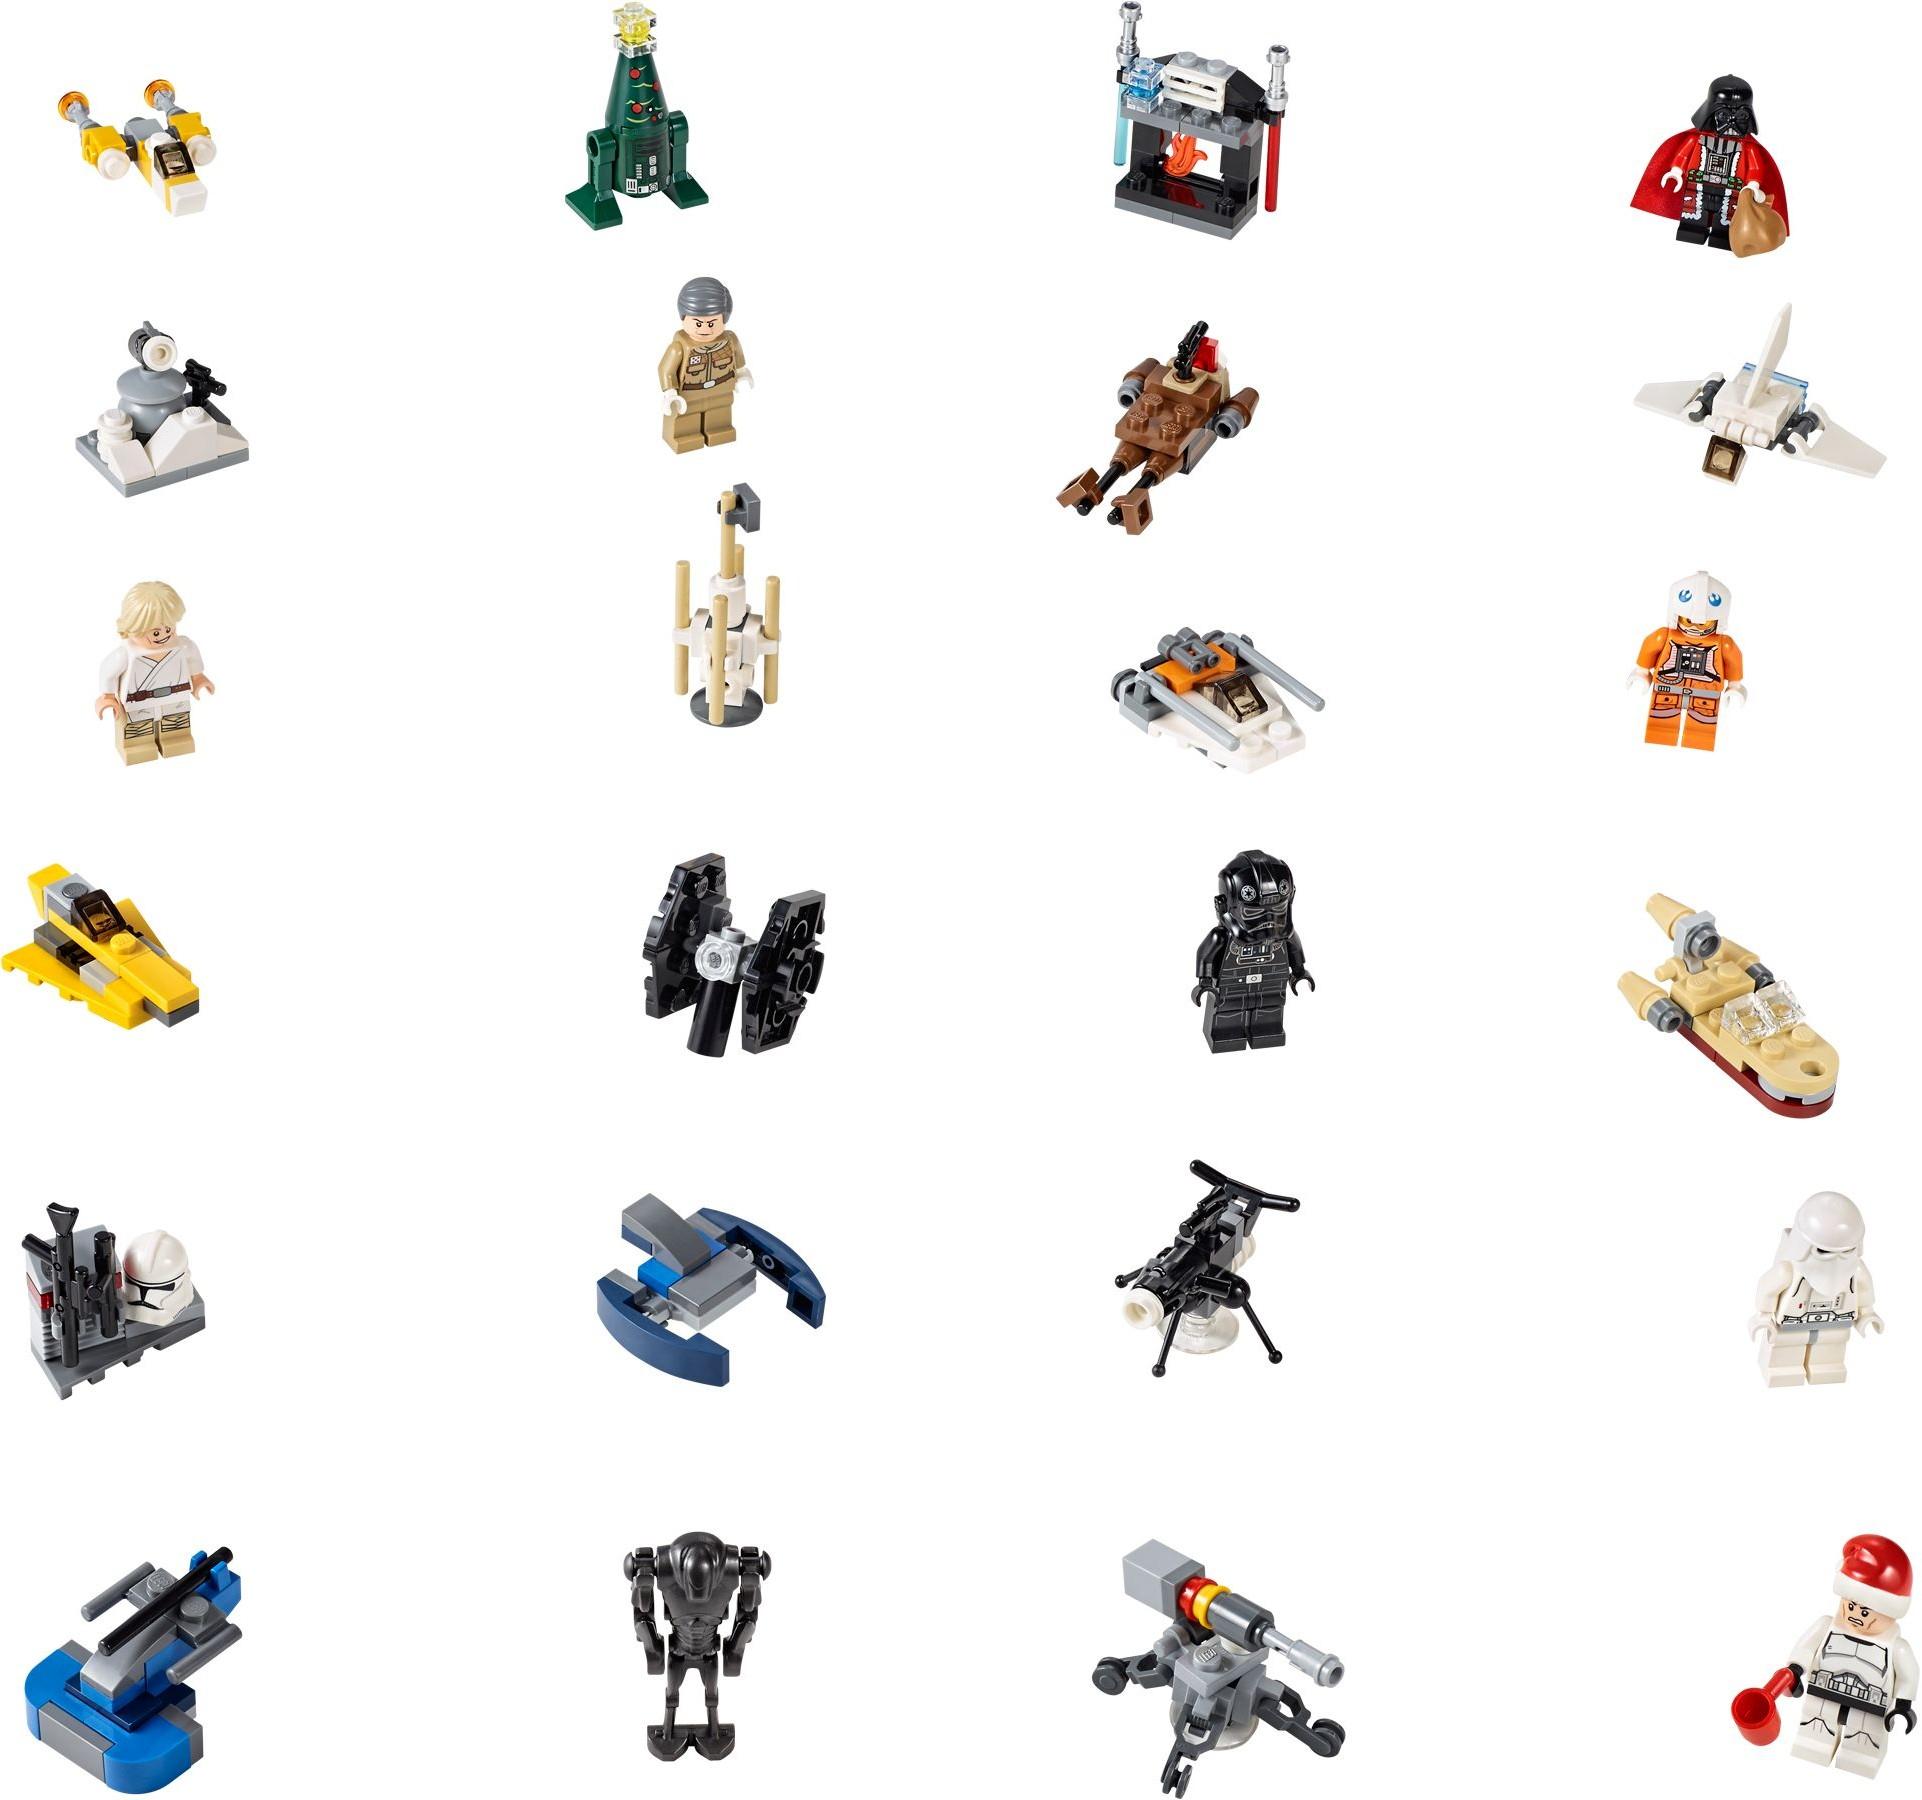 Лего 75056 Star Wars Advent Calendar with Lego 75213 Instructions